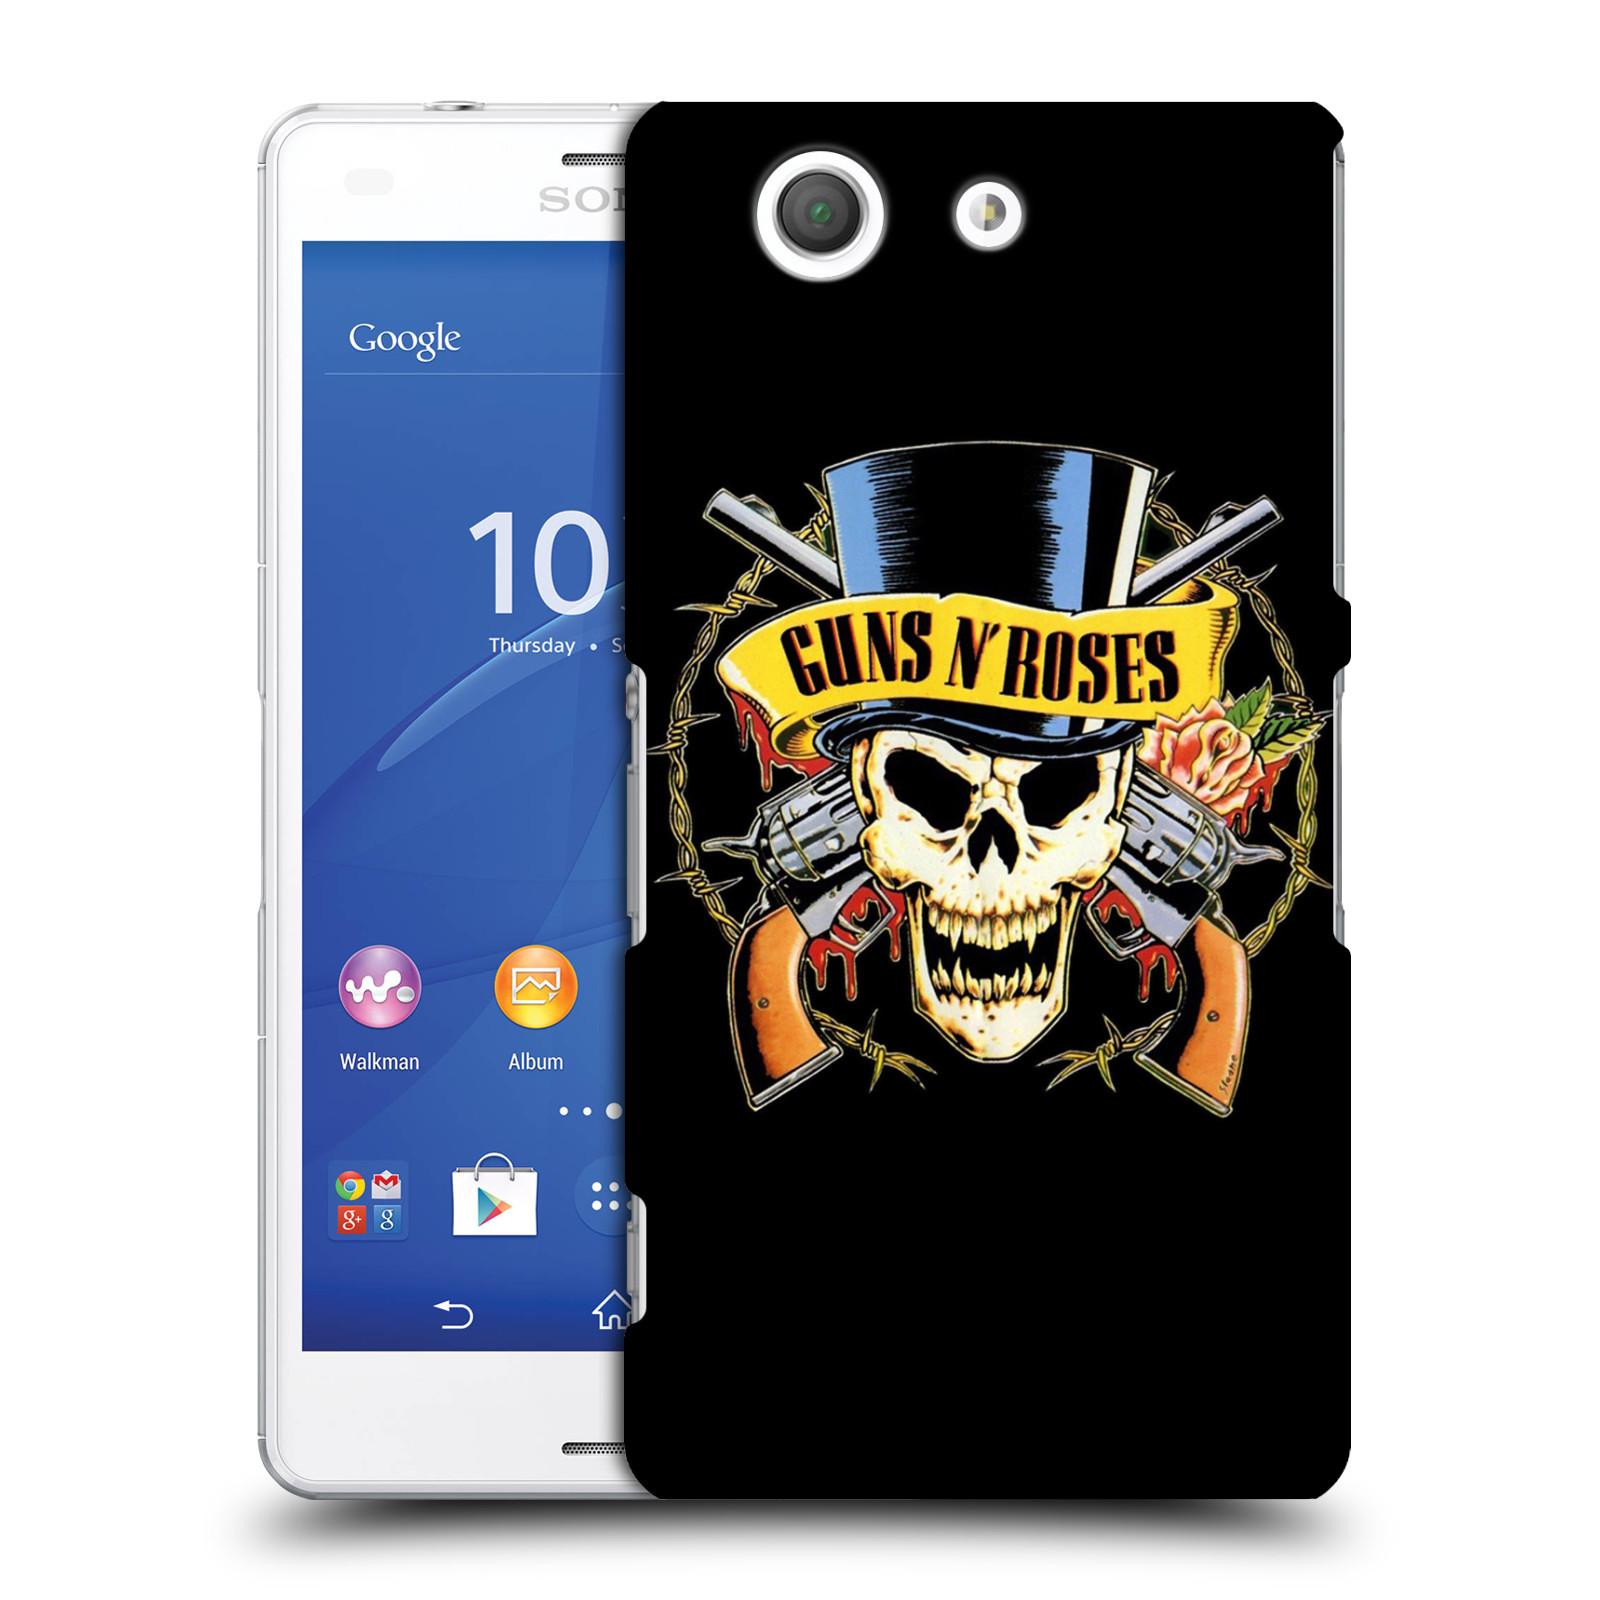 Plastové pouzdro na mobil Sony Xperia Z3 Compact D5803 HEAD CASE Guns N' Roses - Lebka